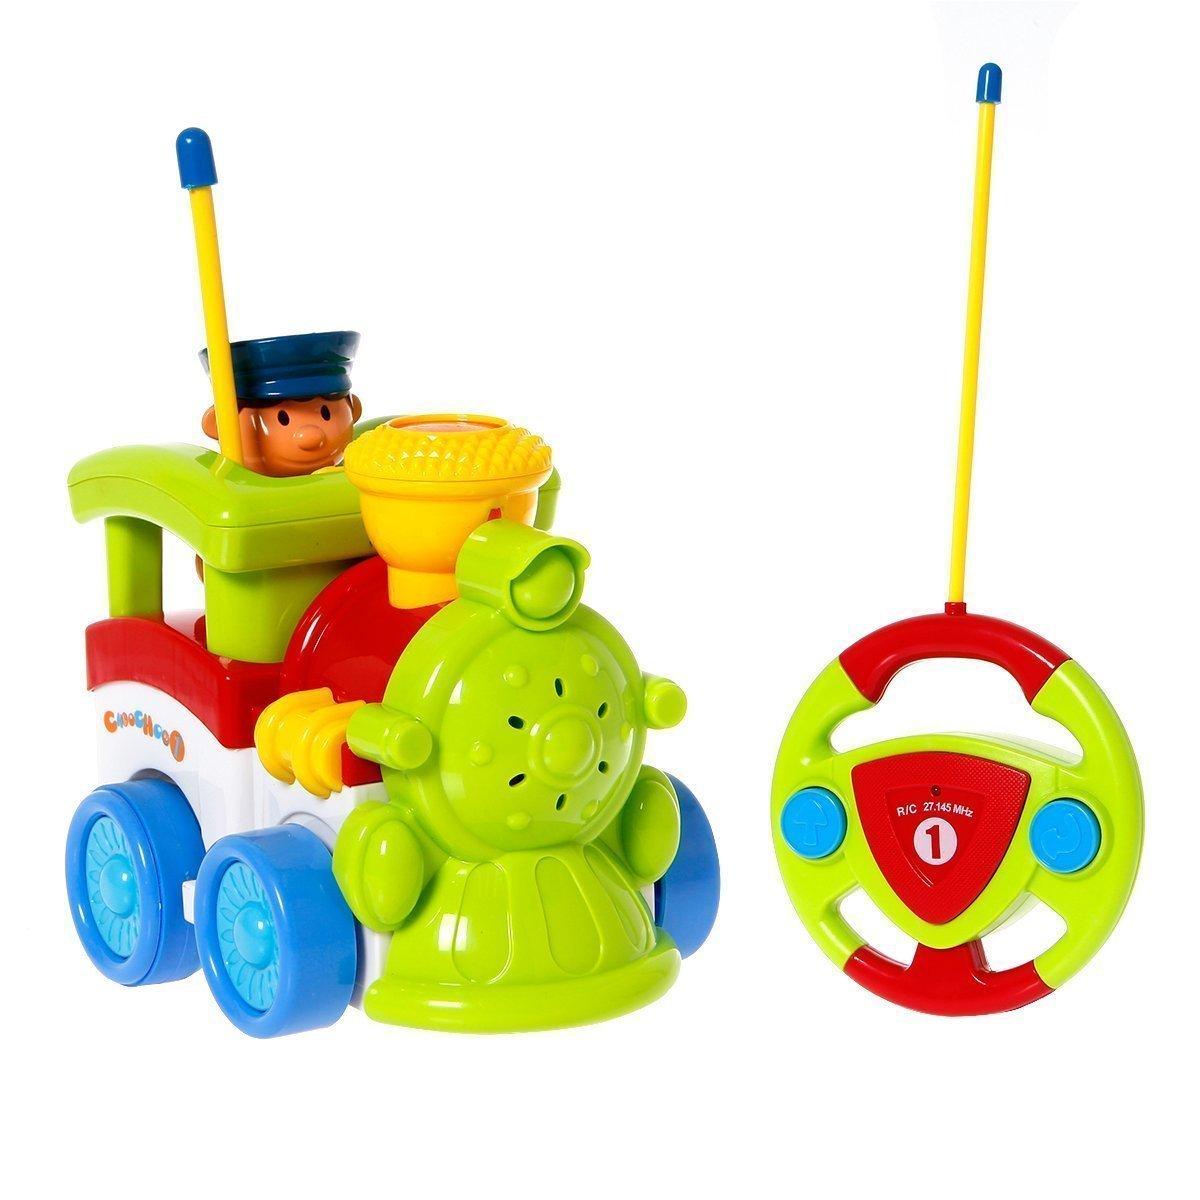 1200x1200 Cartoon Rc Train Car Radio Control Toy For Toddlers